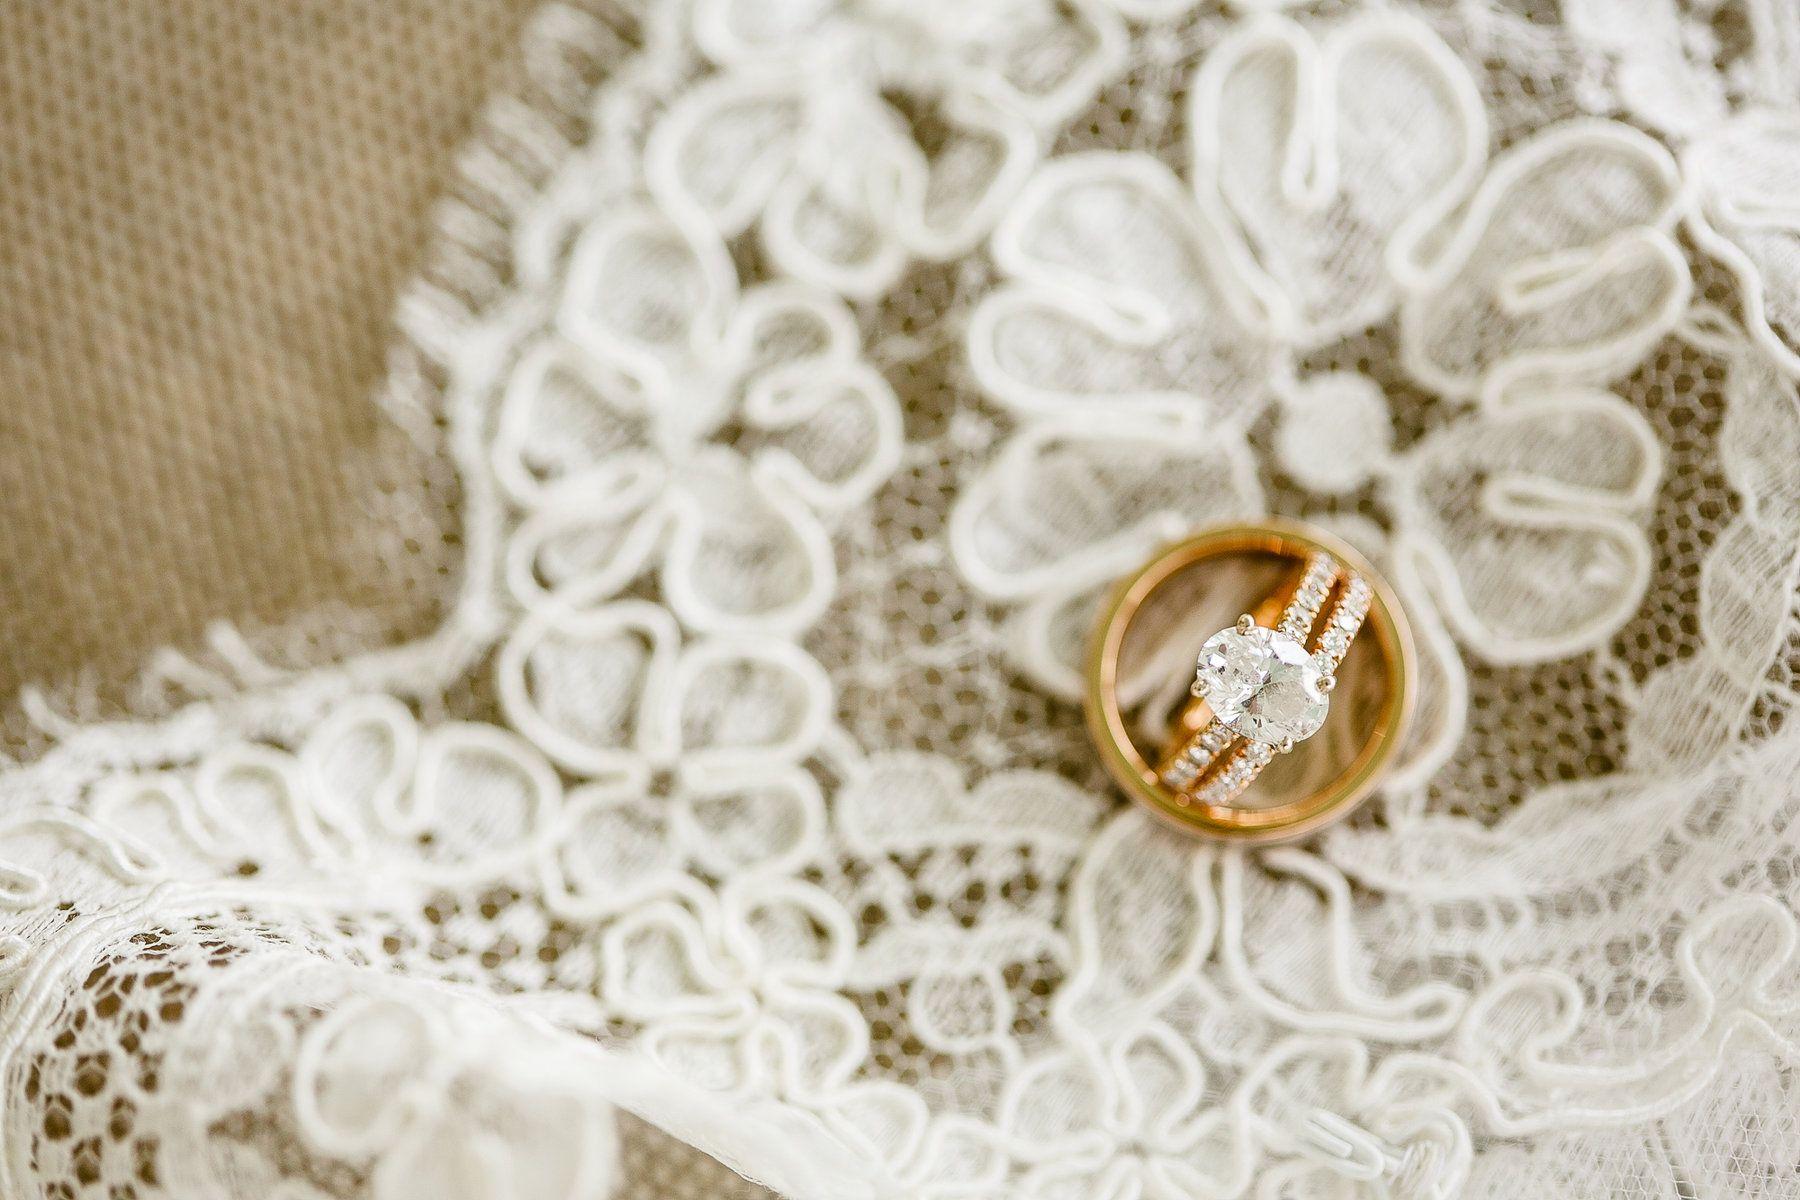 Wedding rings detail photo - Janelle Elise photography